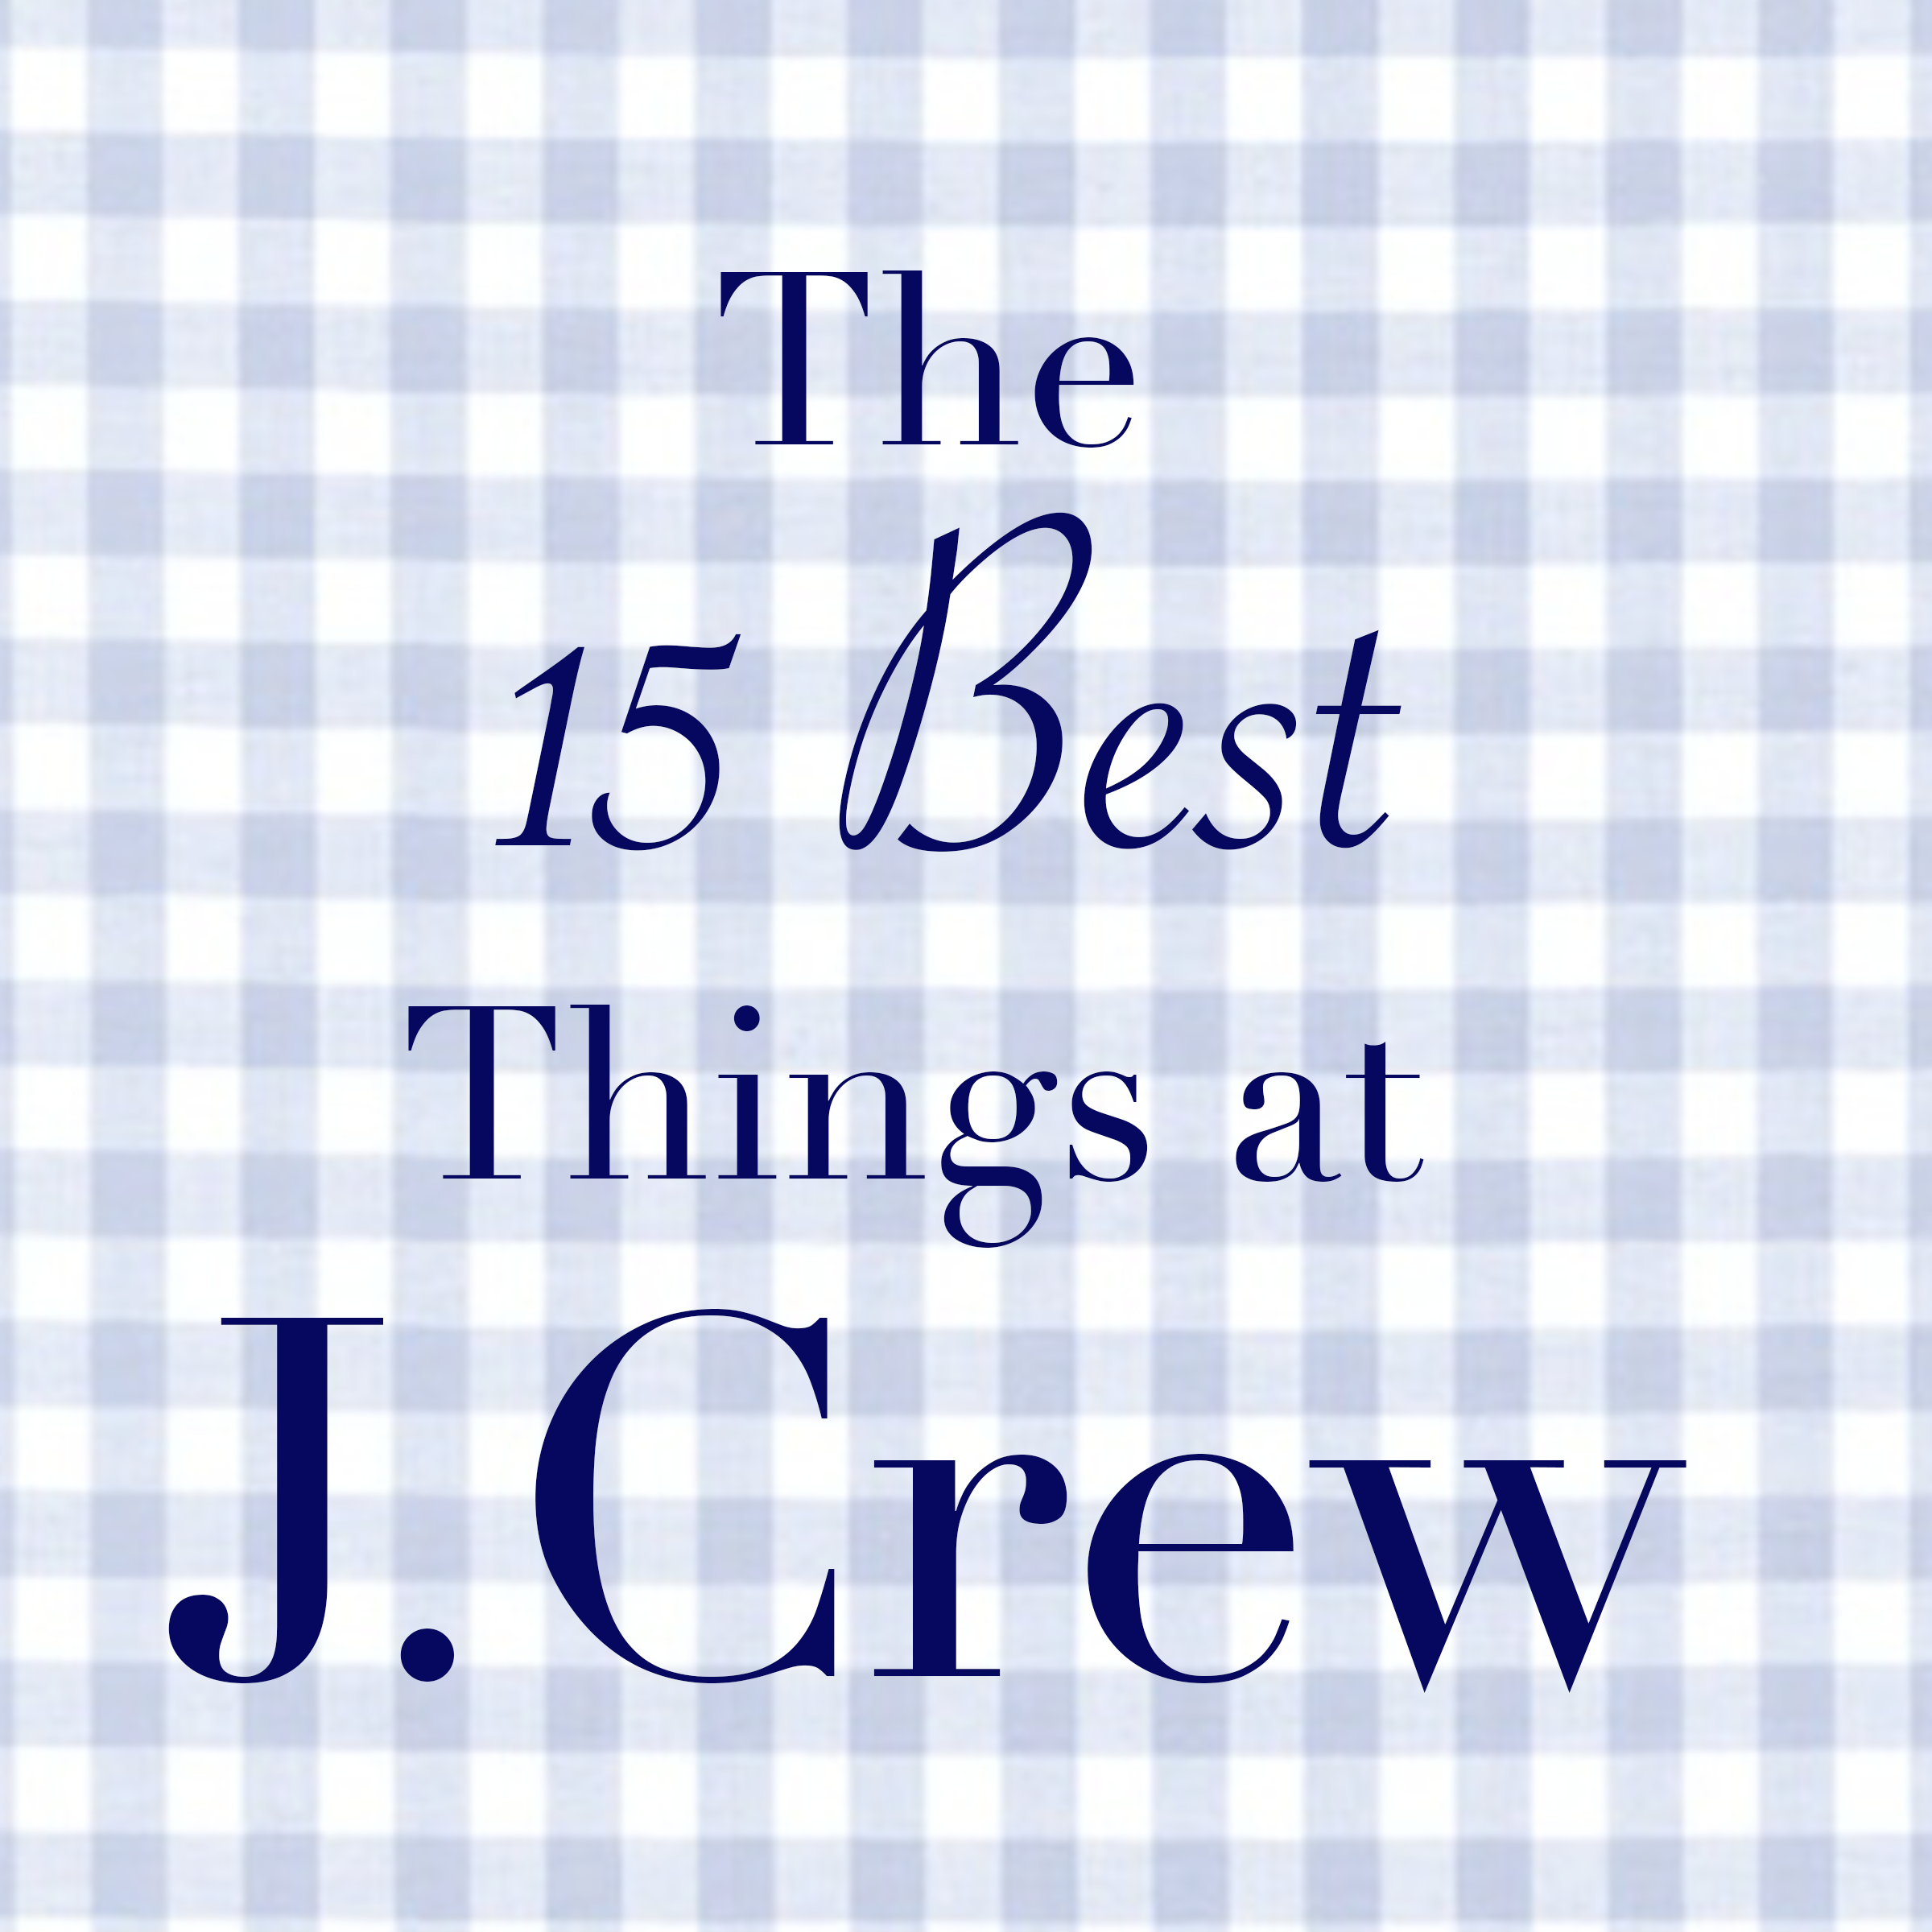 My Favorite Jcrew Pieces